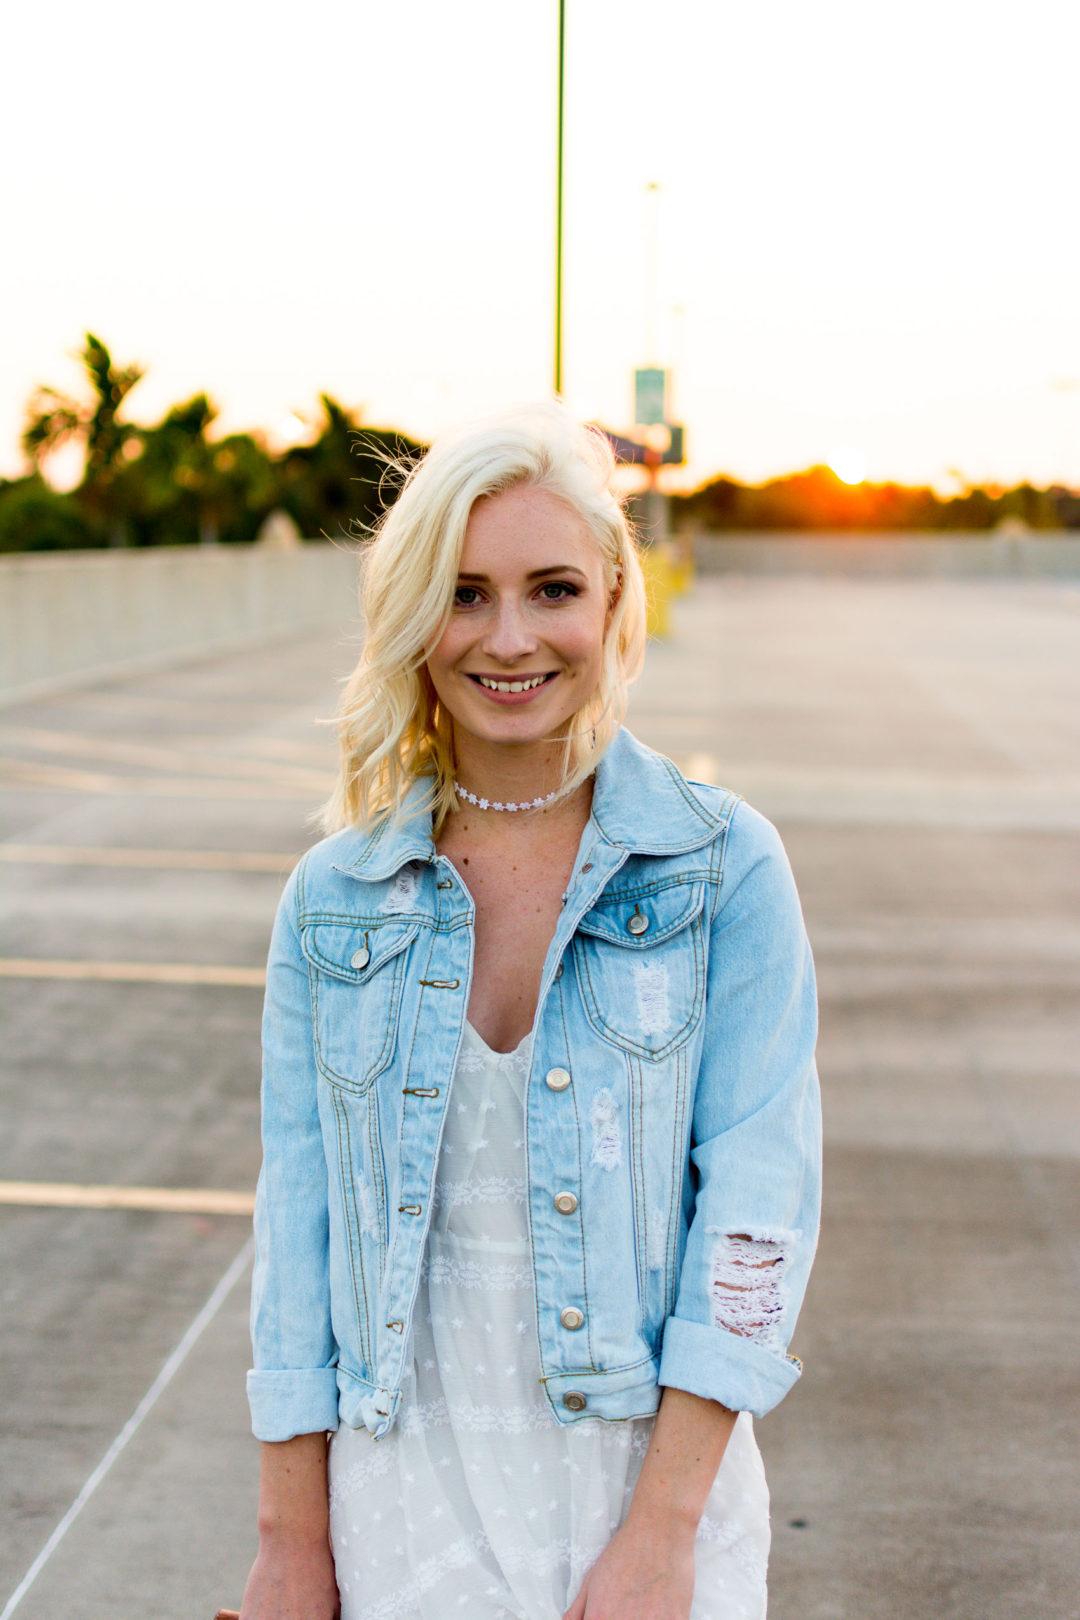 DIY Lace Choker Necklace